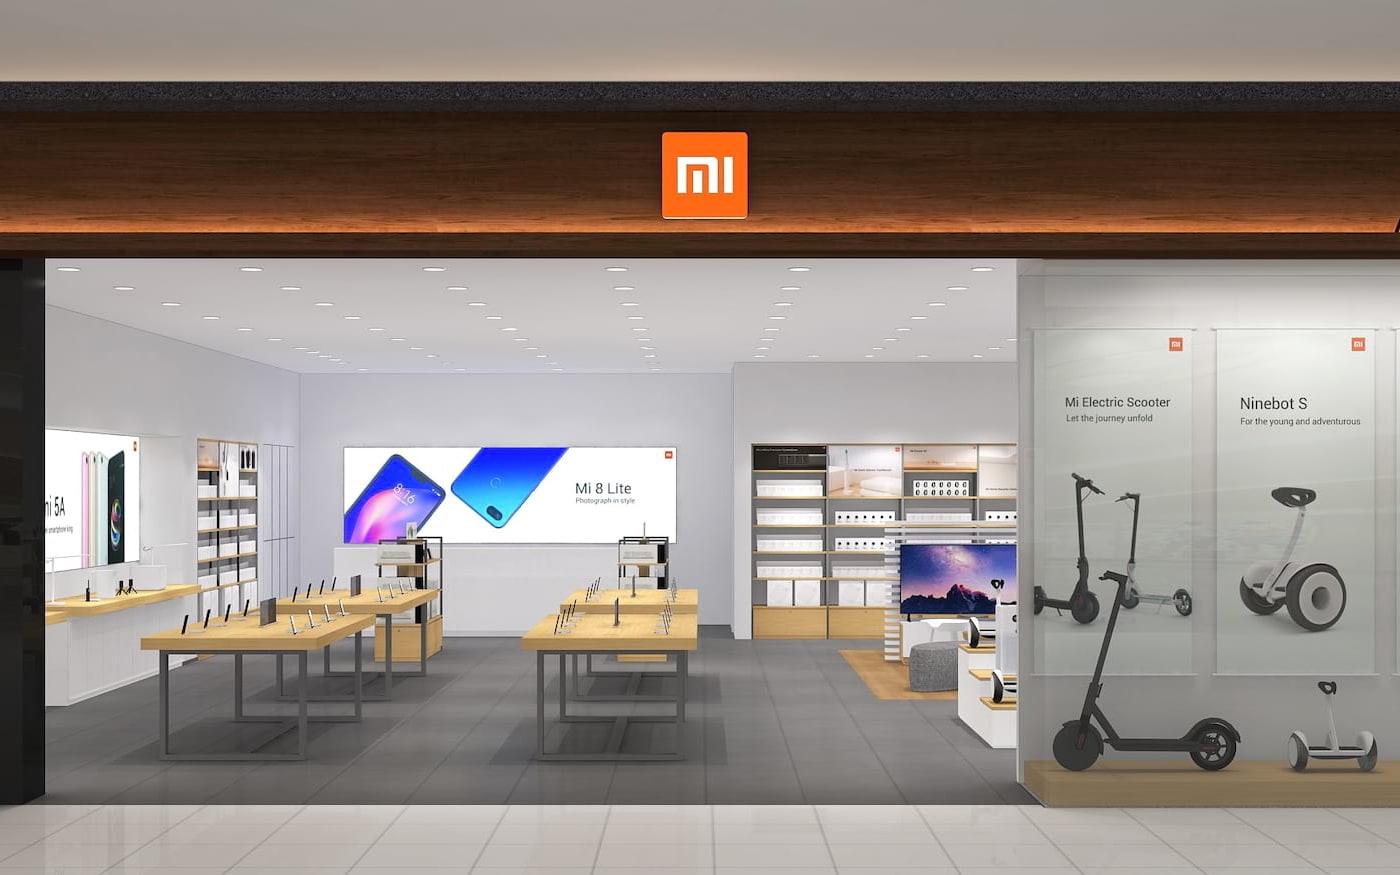 Xiaomi vai inaugurar segunda loja física em São Paulo